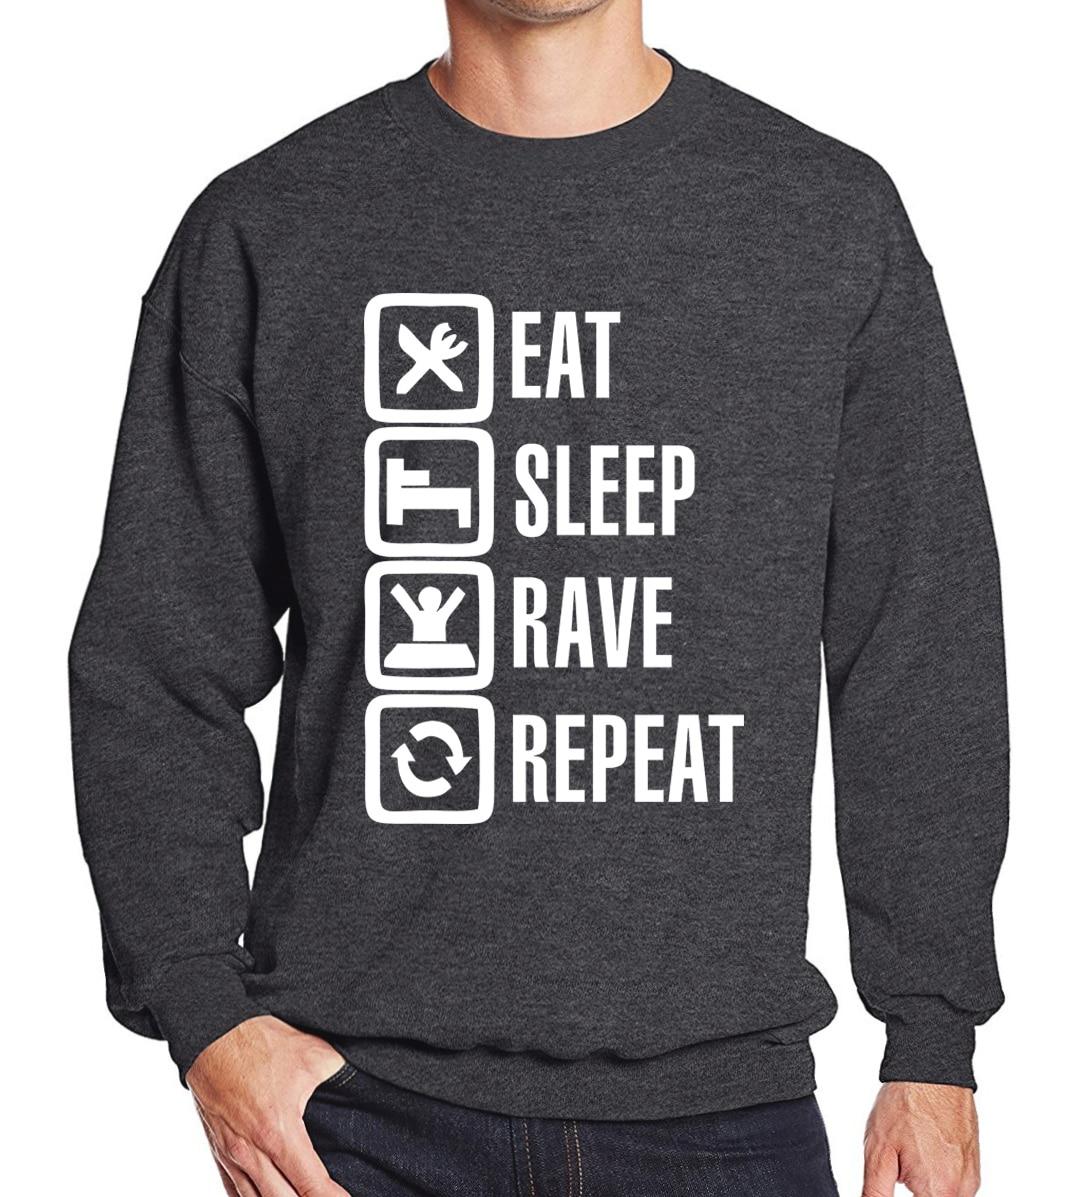 Funny Hoody Eat Sleep Rave Repeat 2019 Spring Winter Hoodies Men Sweatshirt Fleece Men's Sportswear Fashion Casual Moletom